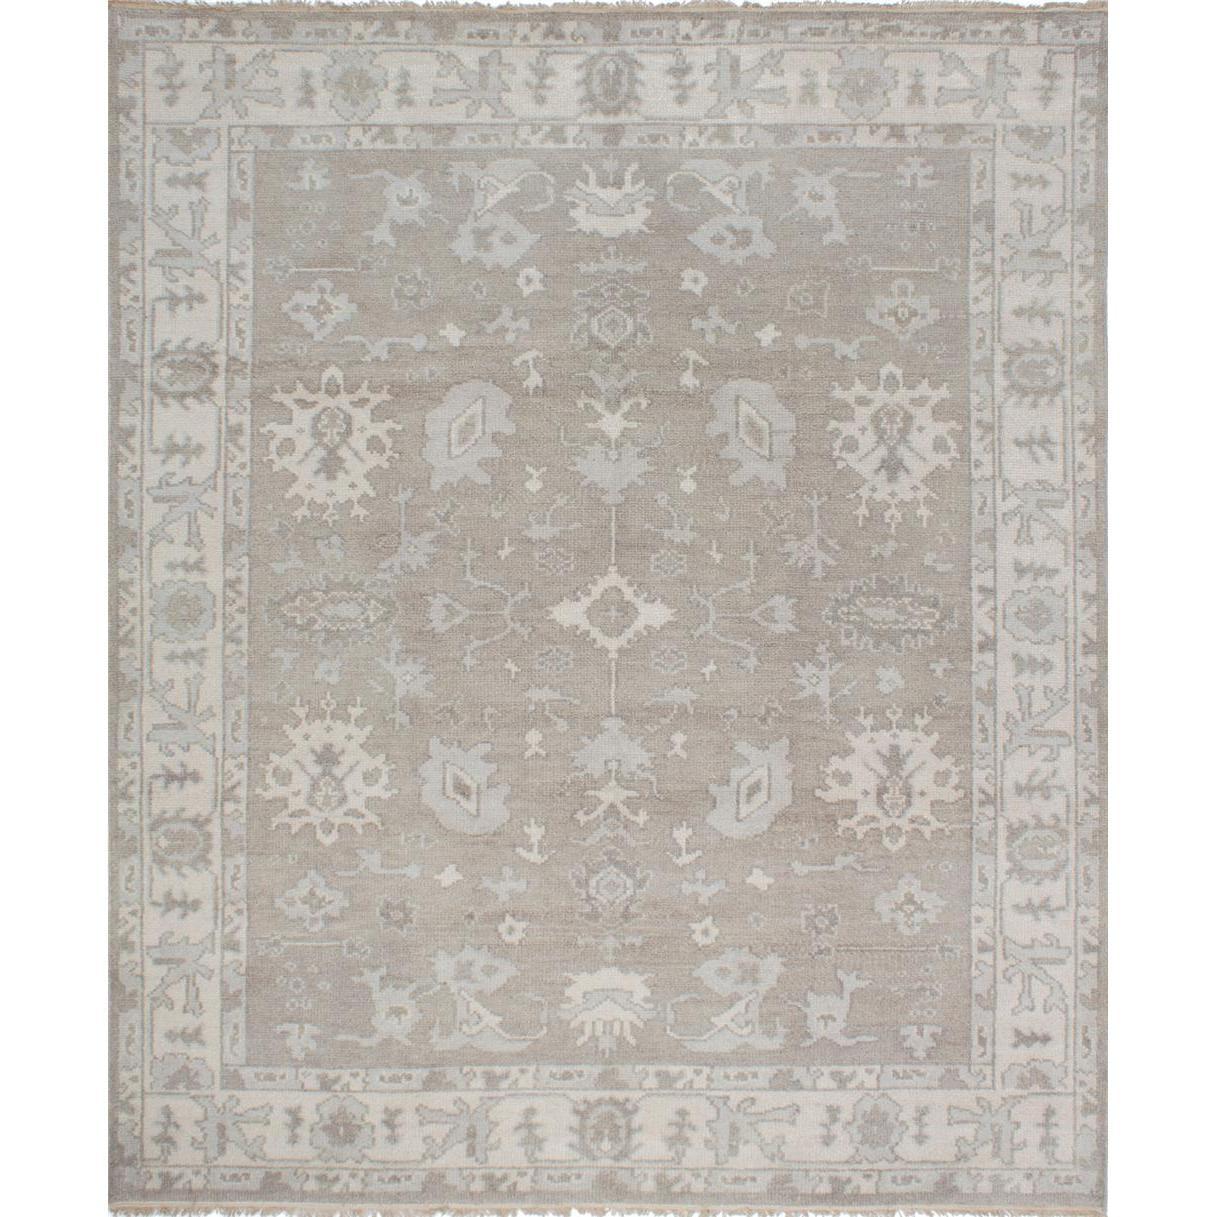 Ecarpetgallery  Hand-knotted Ushak Grey Wool Rug (8' x 9'8)